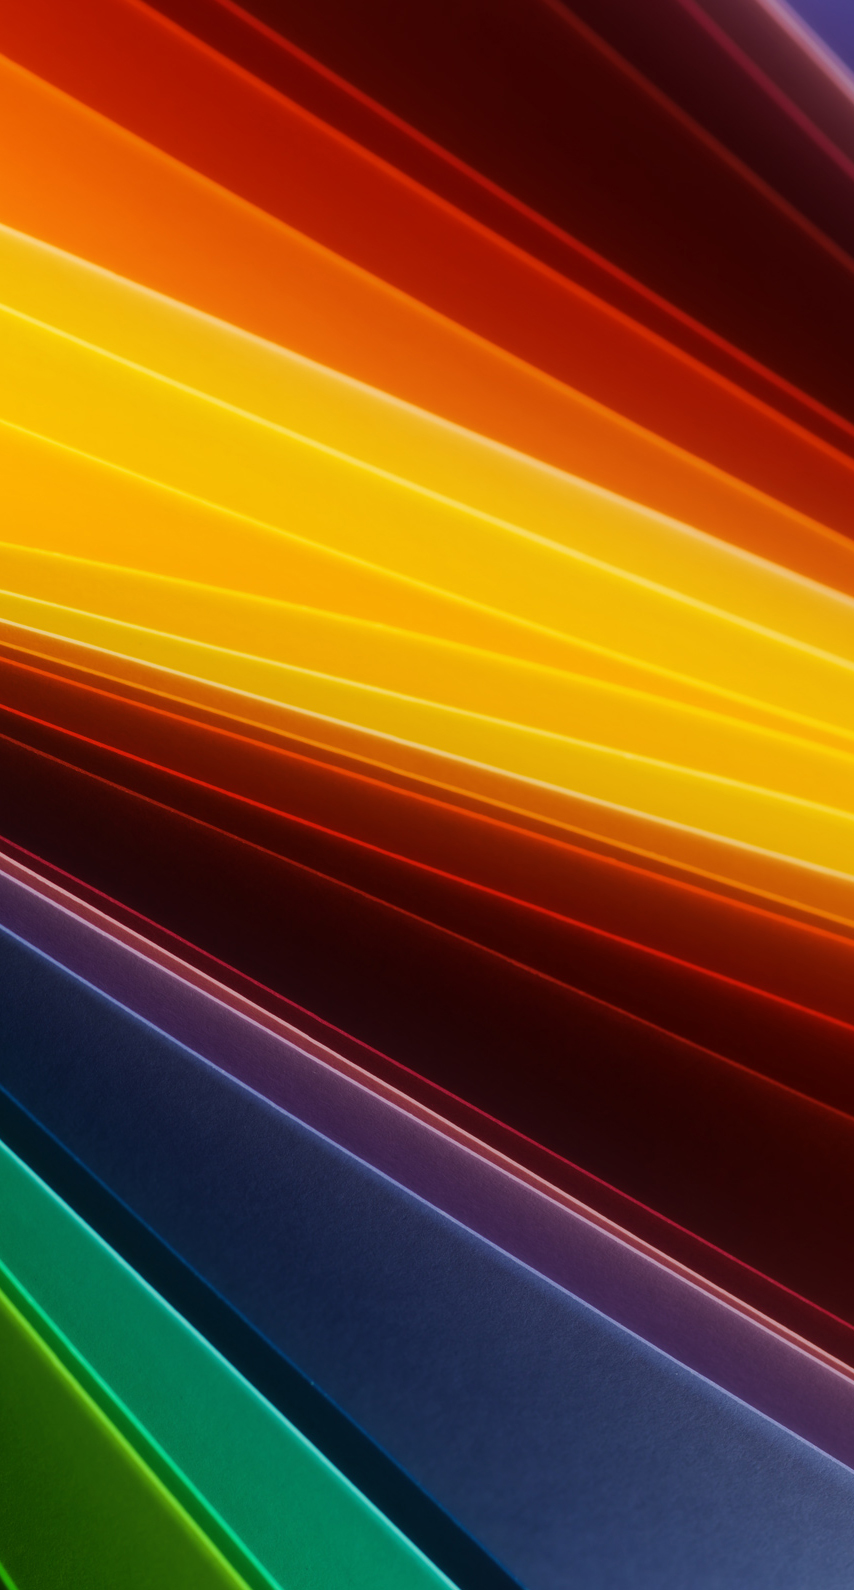 wallpaper, motion, illustration, blur, line, stripe, luminescence, color, fast, movement